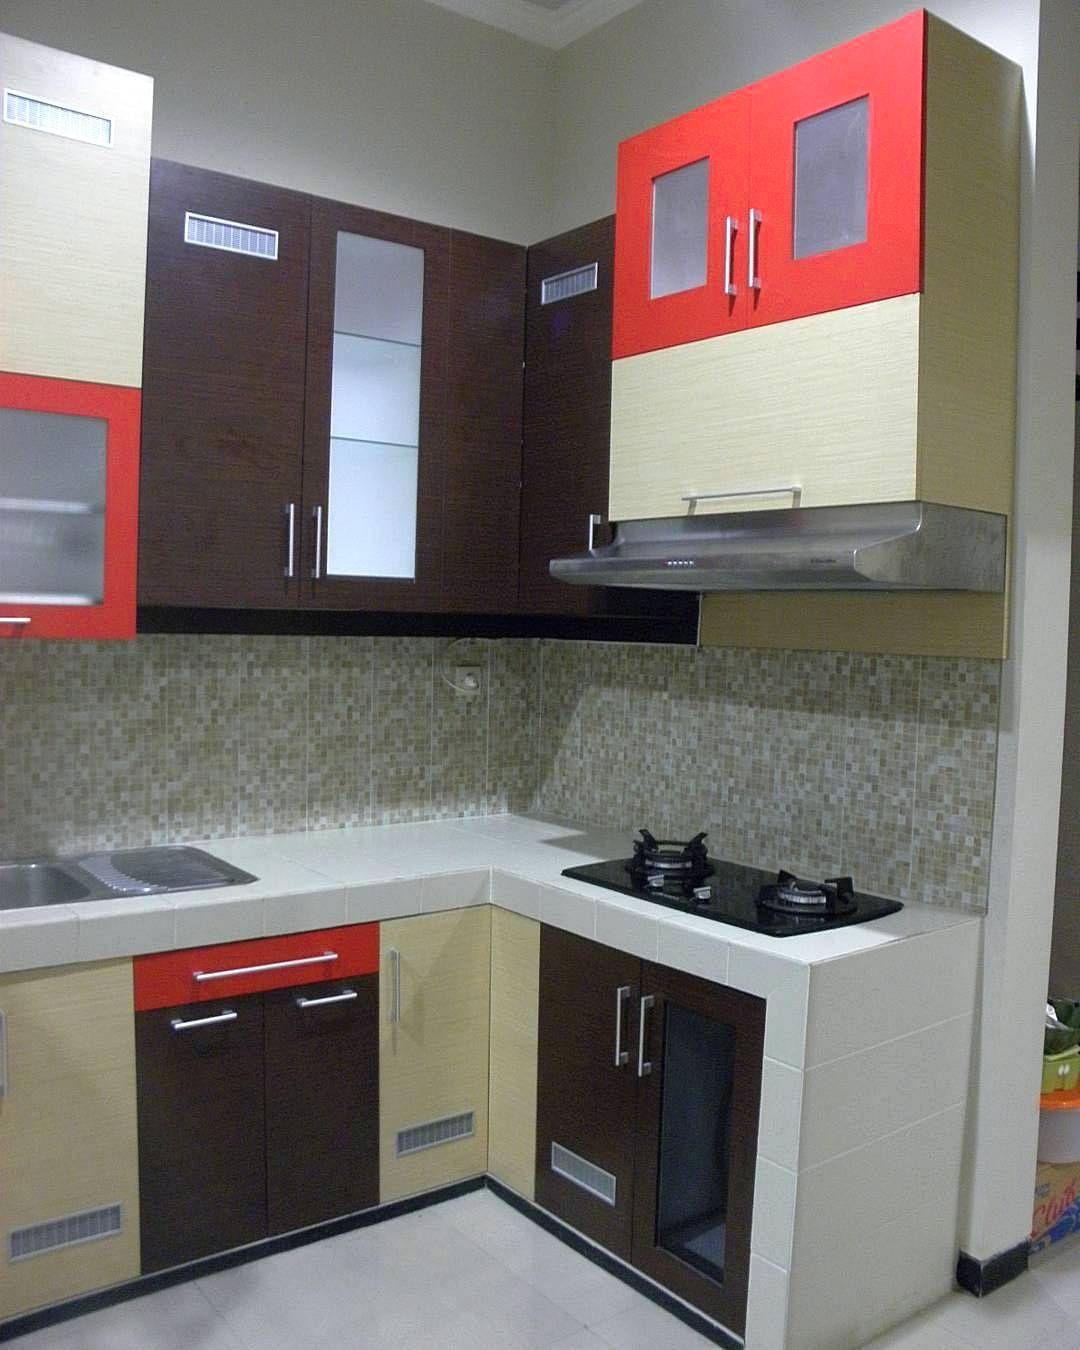 Desain Kitchen Set Sederhana  Dapur Minimalis Idaman di